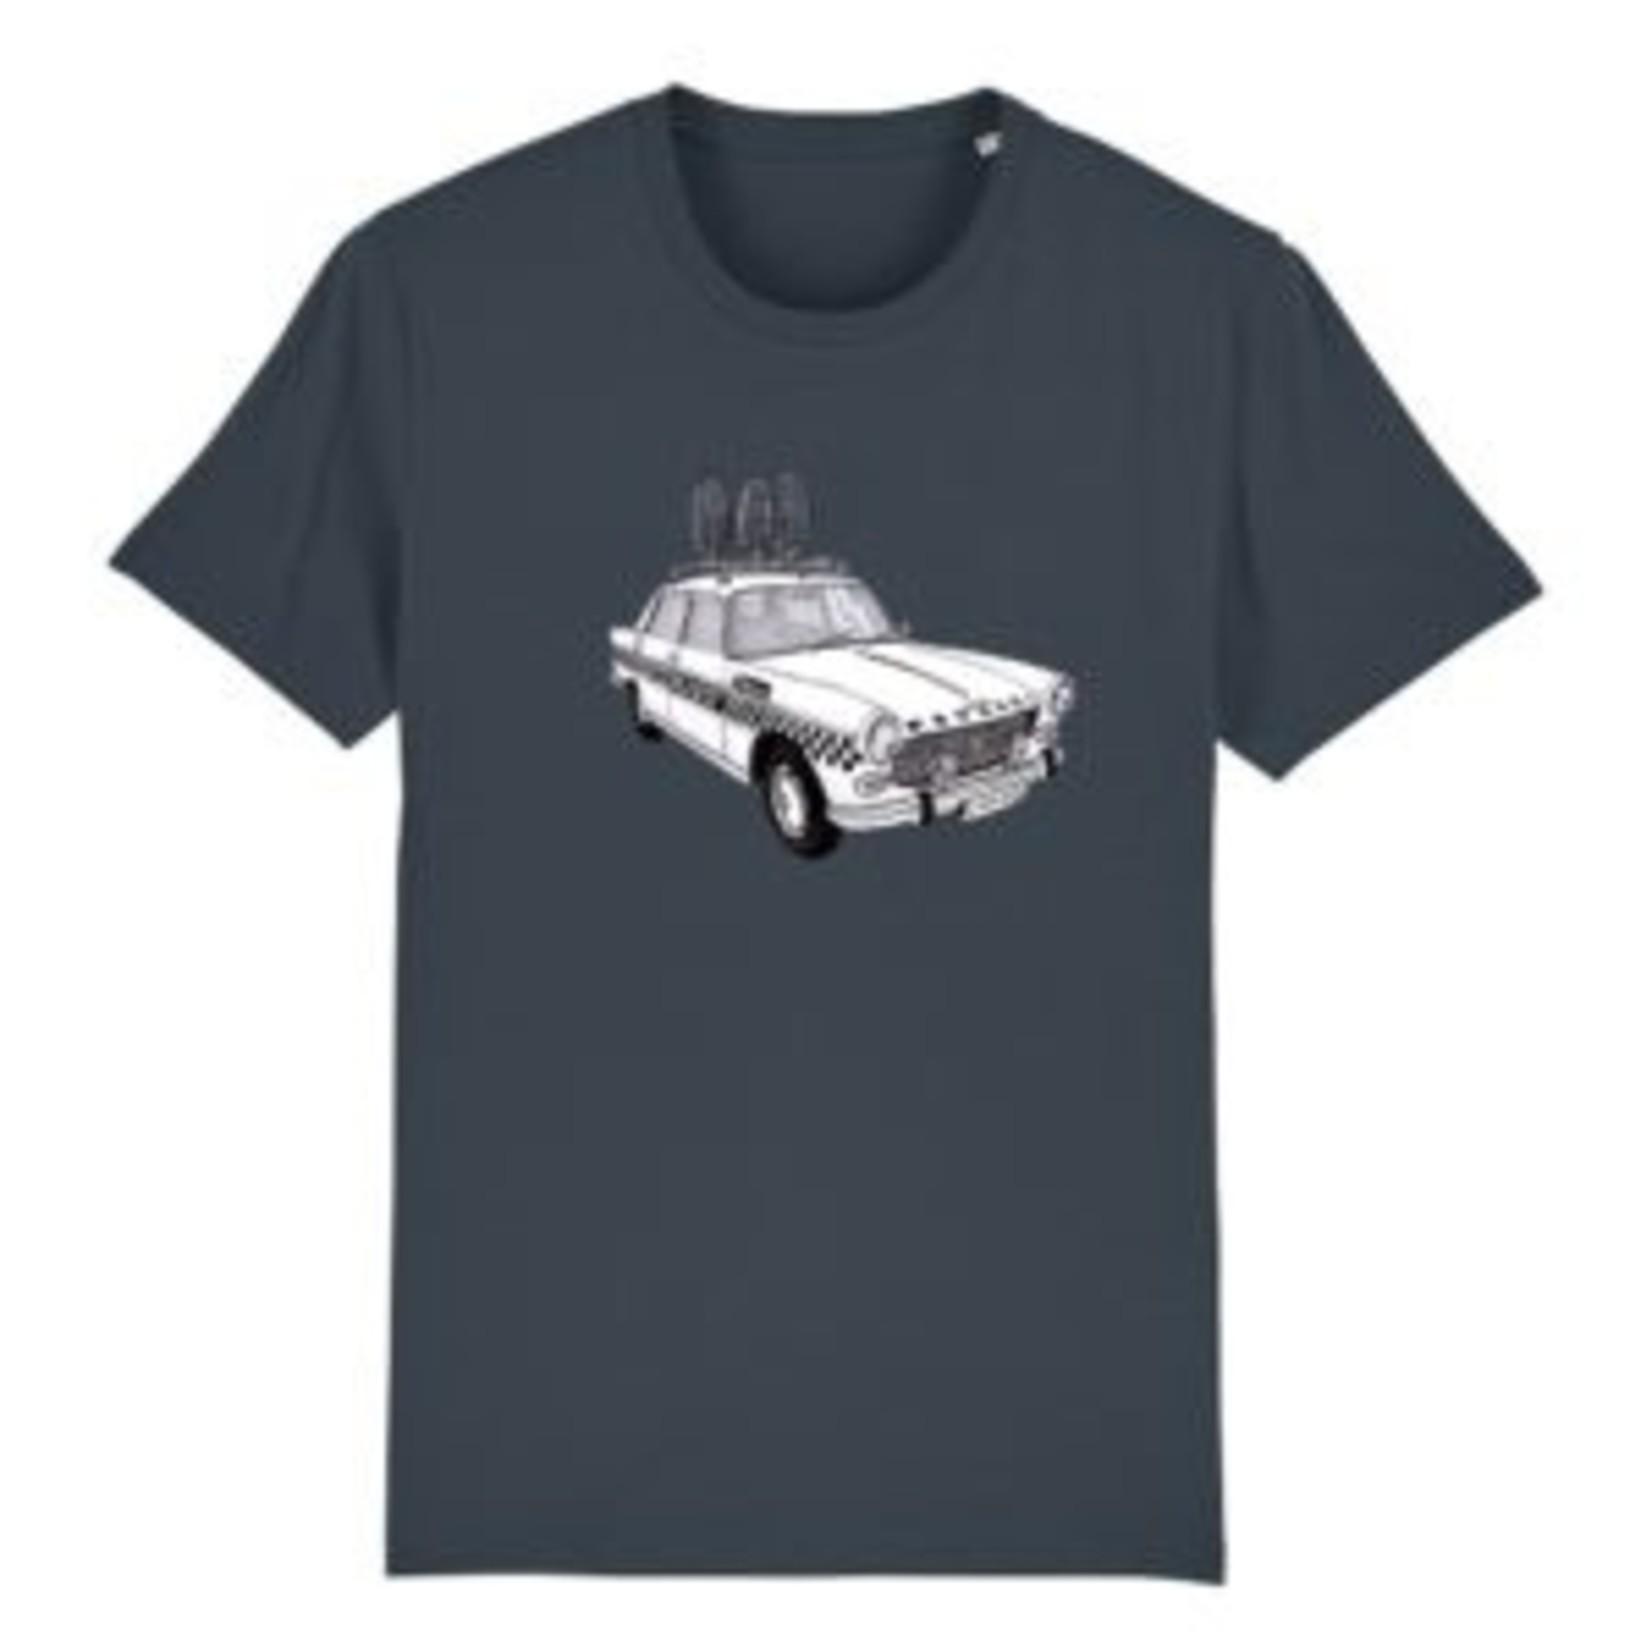 T-shirt Peugeot Team Car